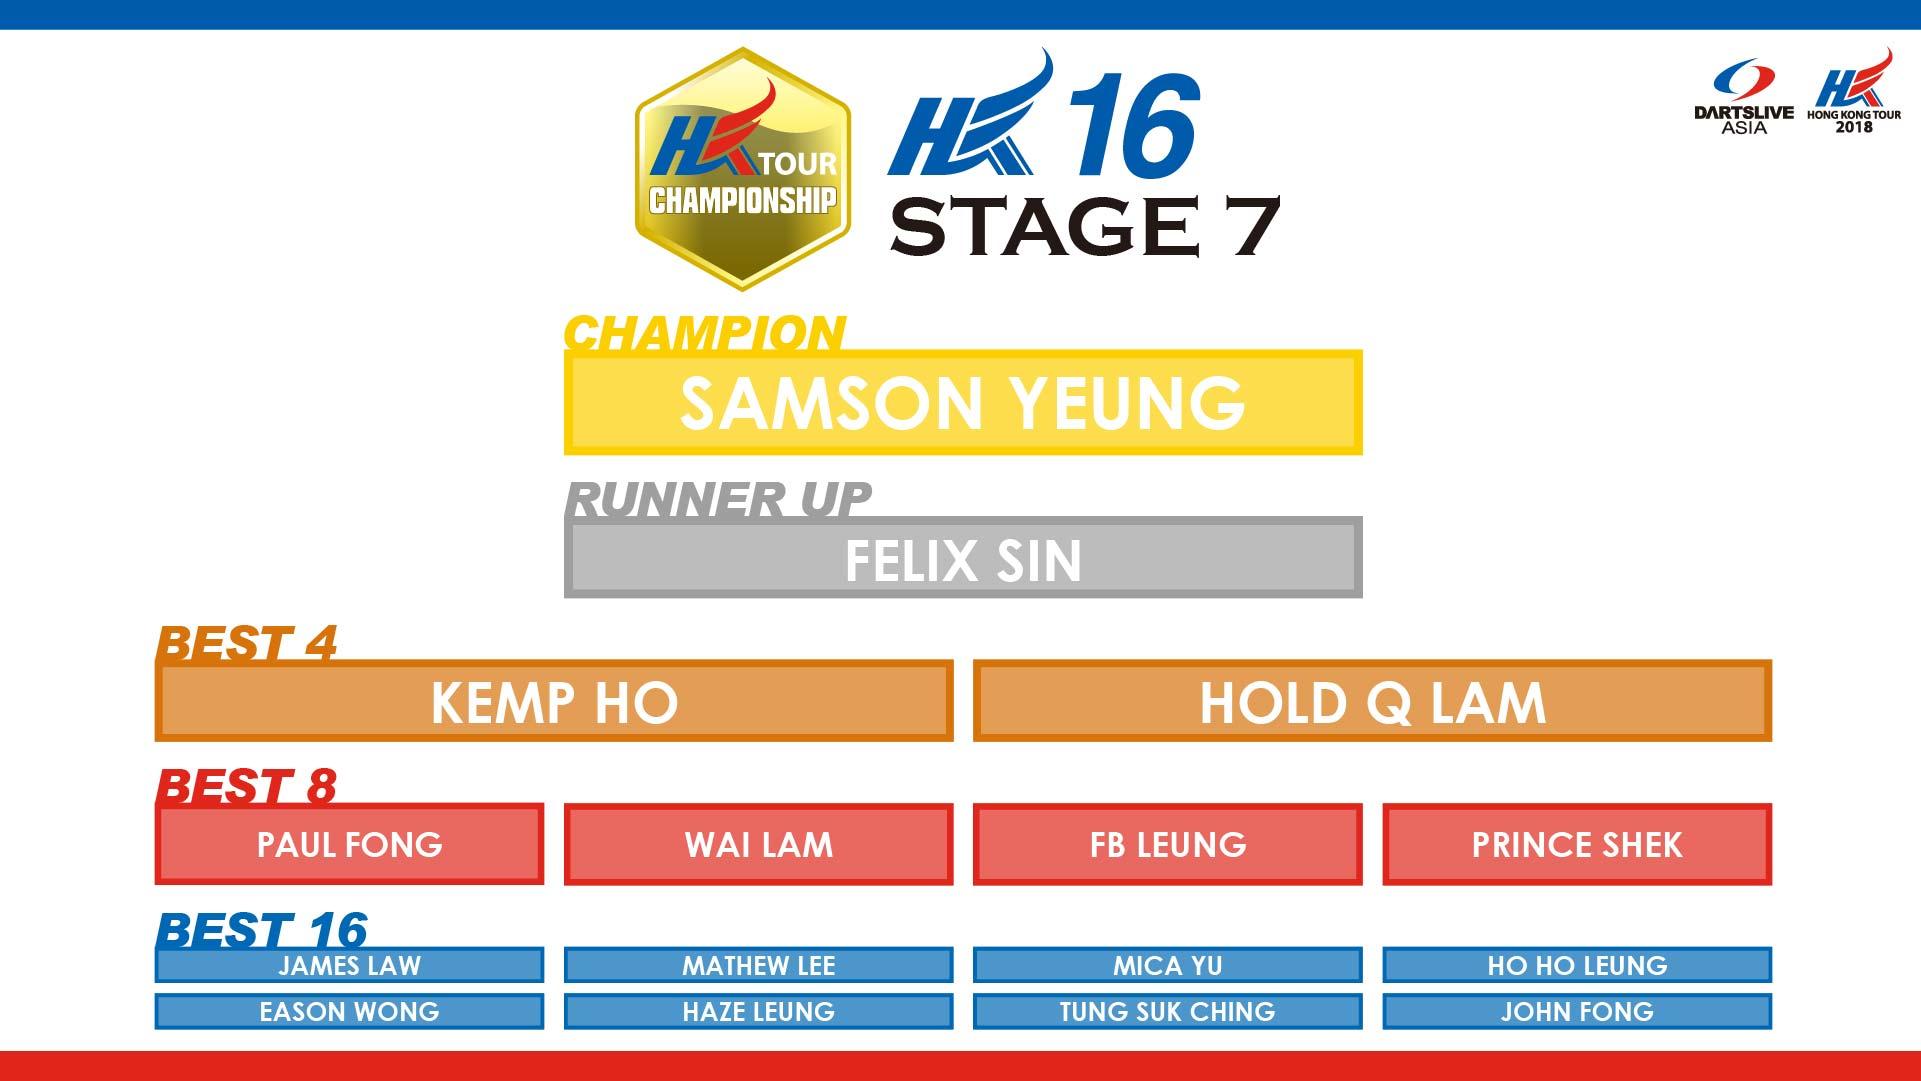 HKTCS 2018 STAGE 7 hk16 RESULT